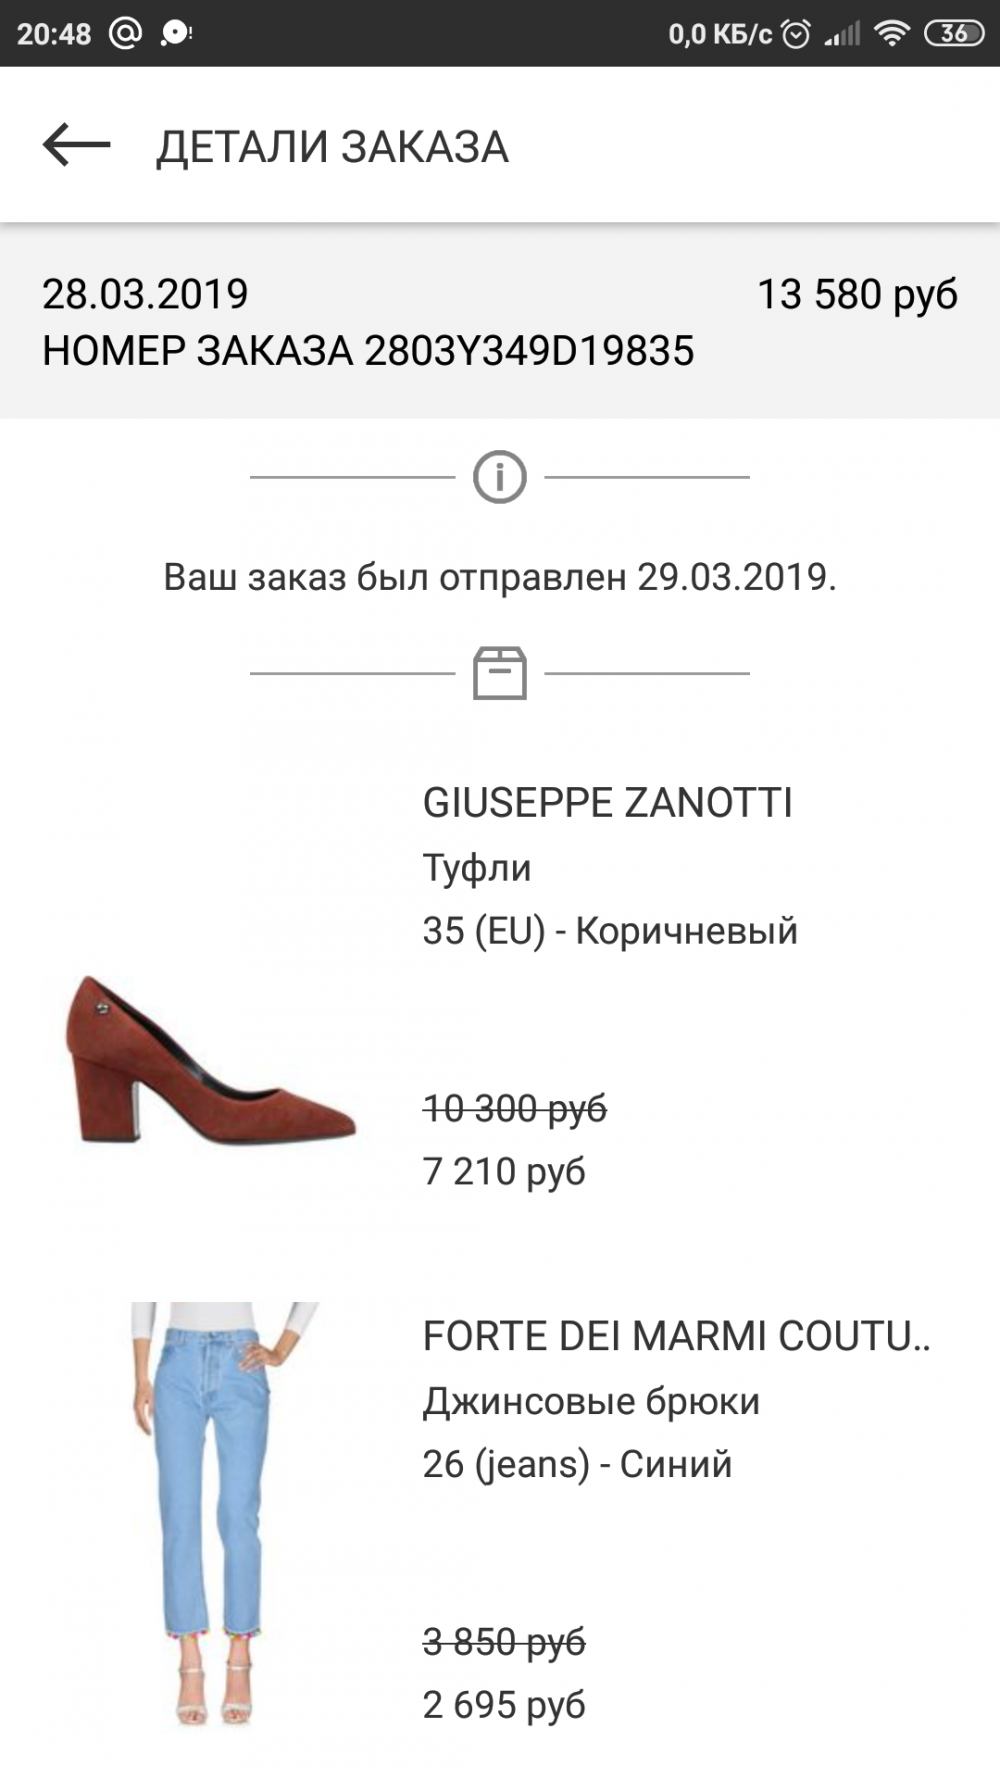 Туфли GIUSEPPE ZANOTTI 35,5-36р